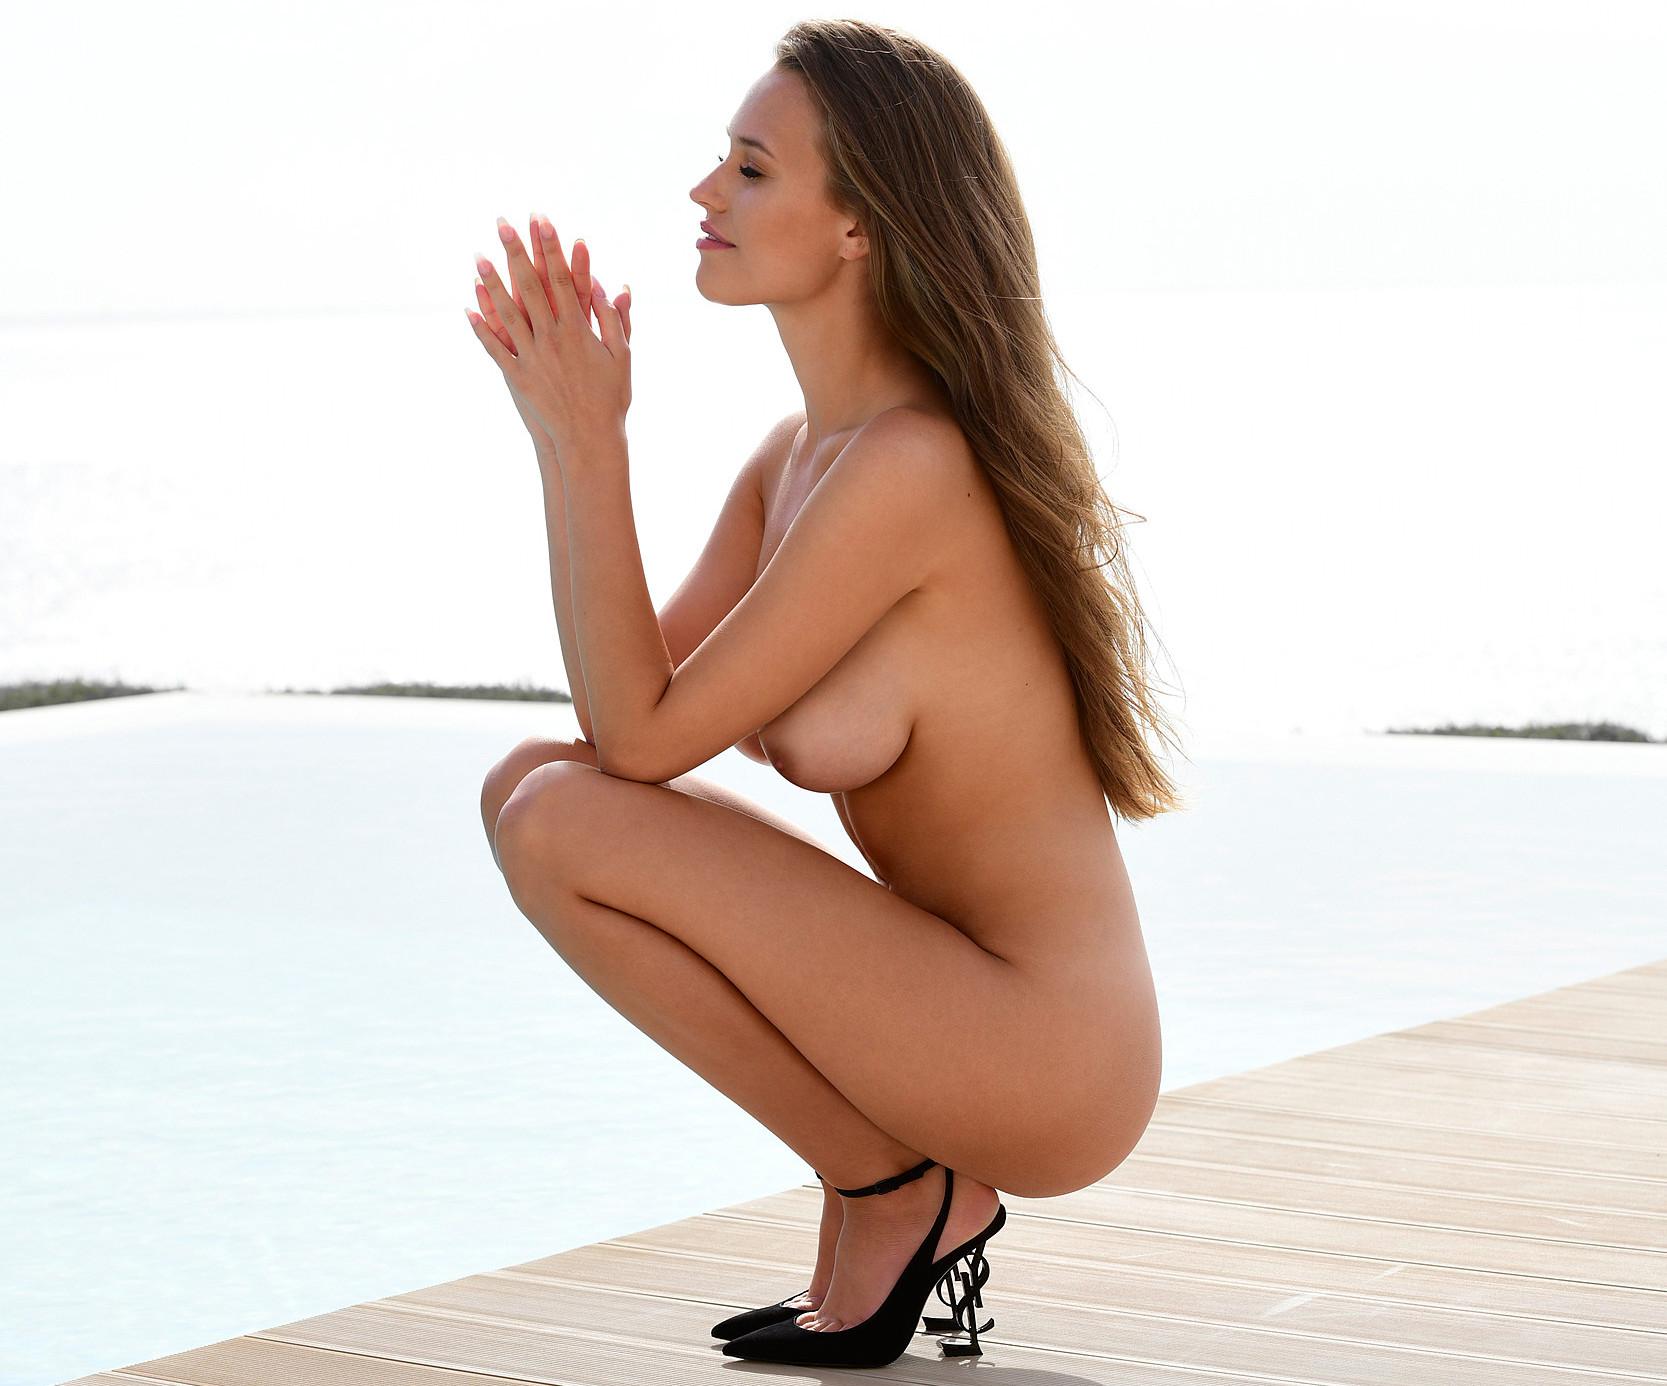 Laura Muller Playboy Germany February 2020 Coverstar Part 3 Avaxhome